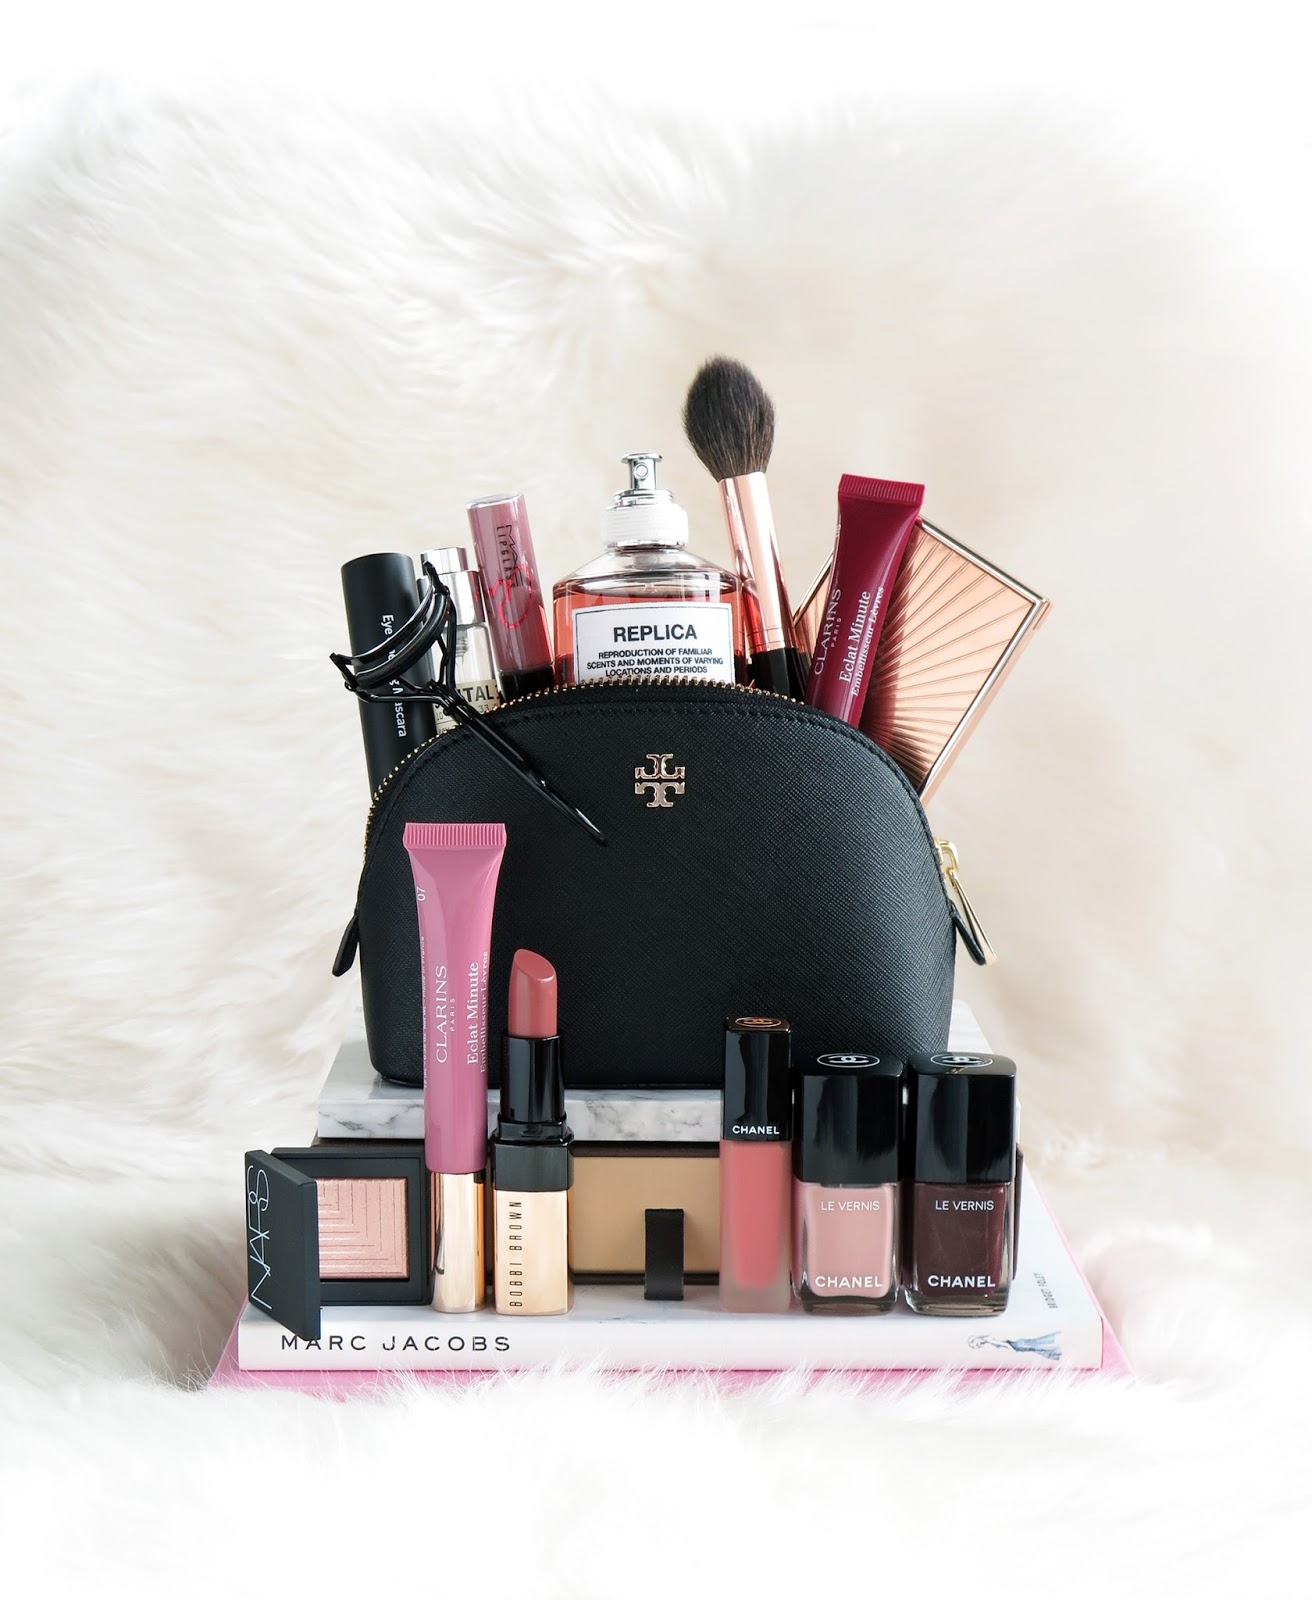 Fall Beauty Makeup Bag - The Beauty Look Book